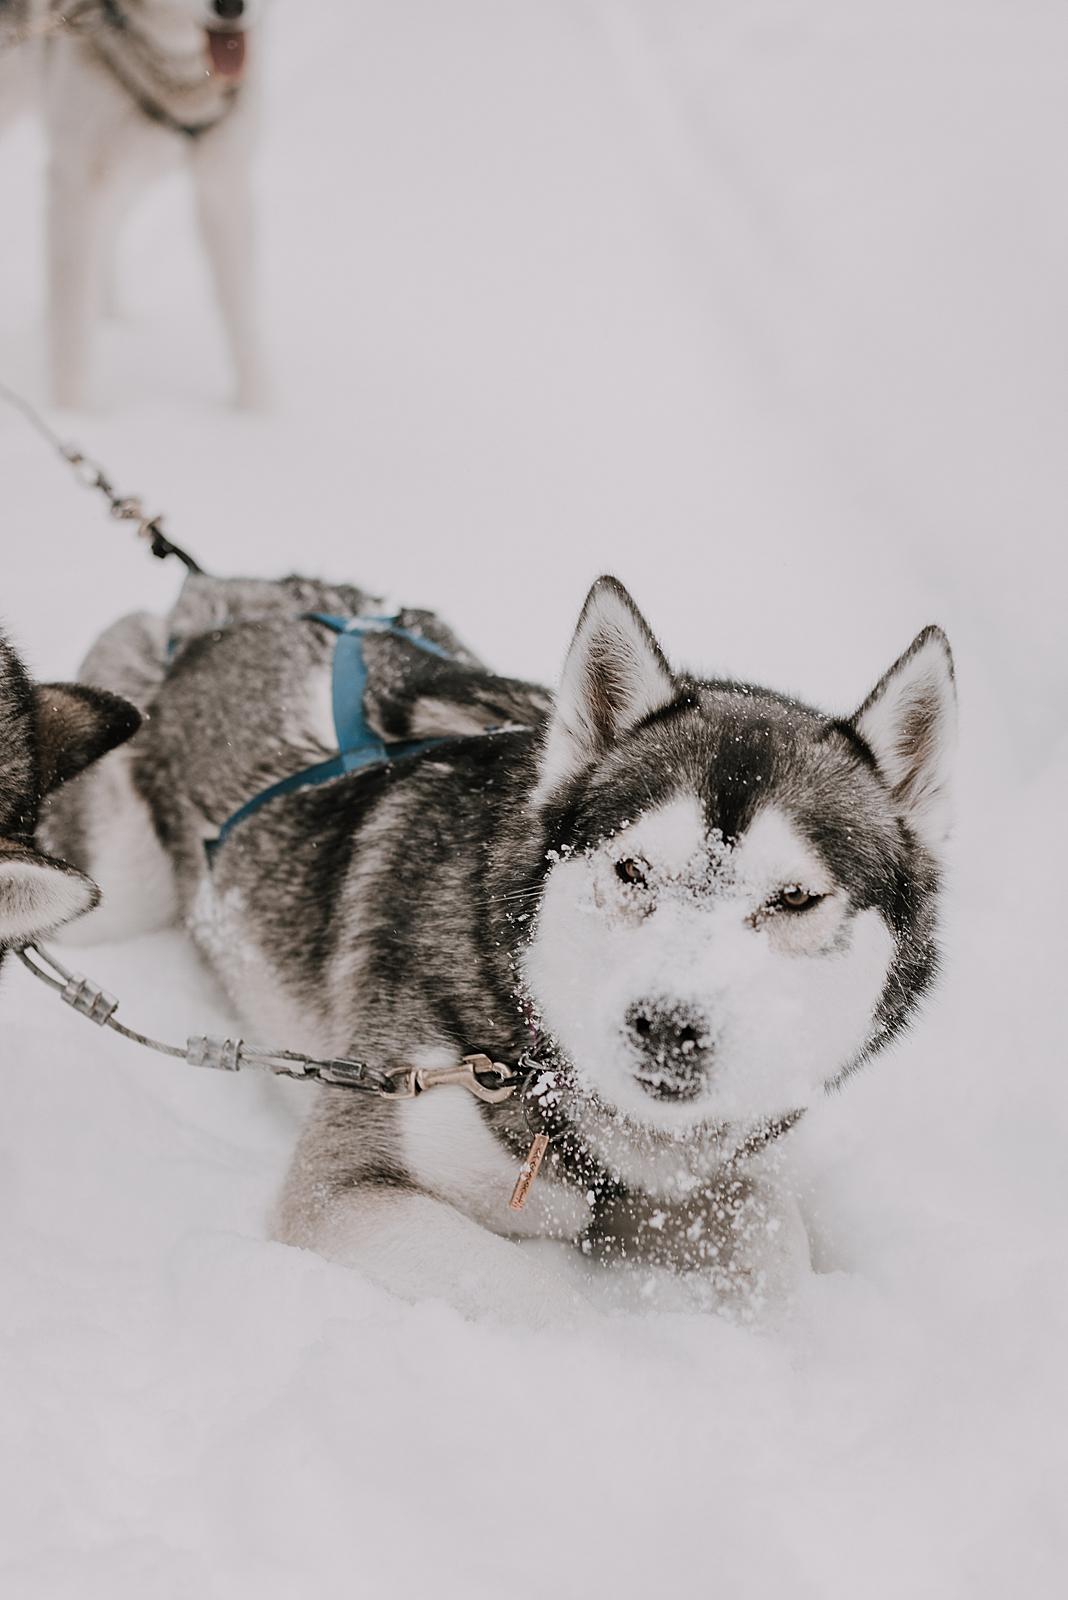 siberian husky, sled dog, dogsledding, winter, winter elopement, winter wedding, breckenridge colorado photographer, colorado dog sledding, alaska, dogsledding elopement, snowmobiling elopement